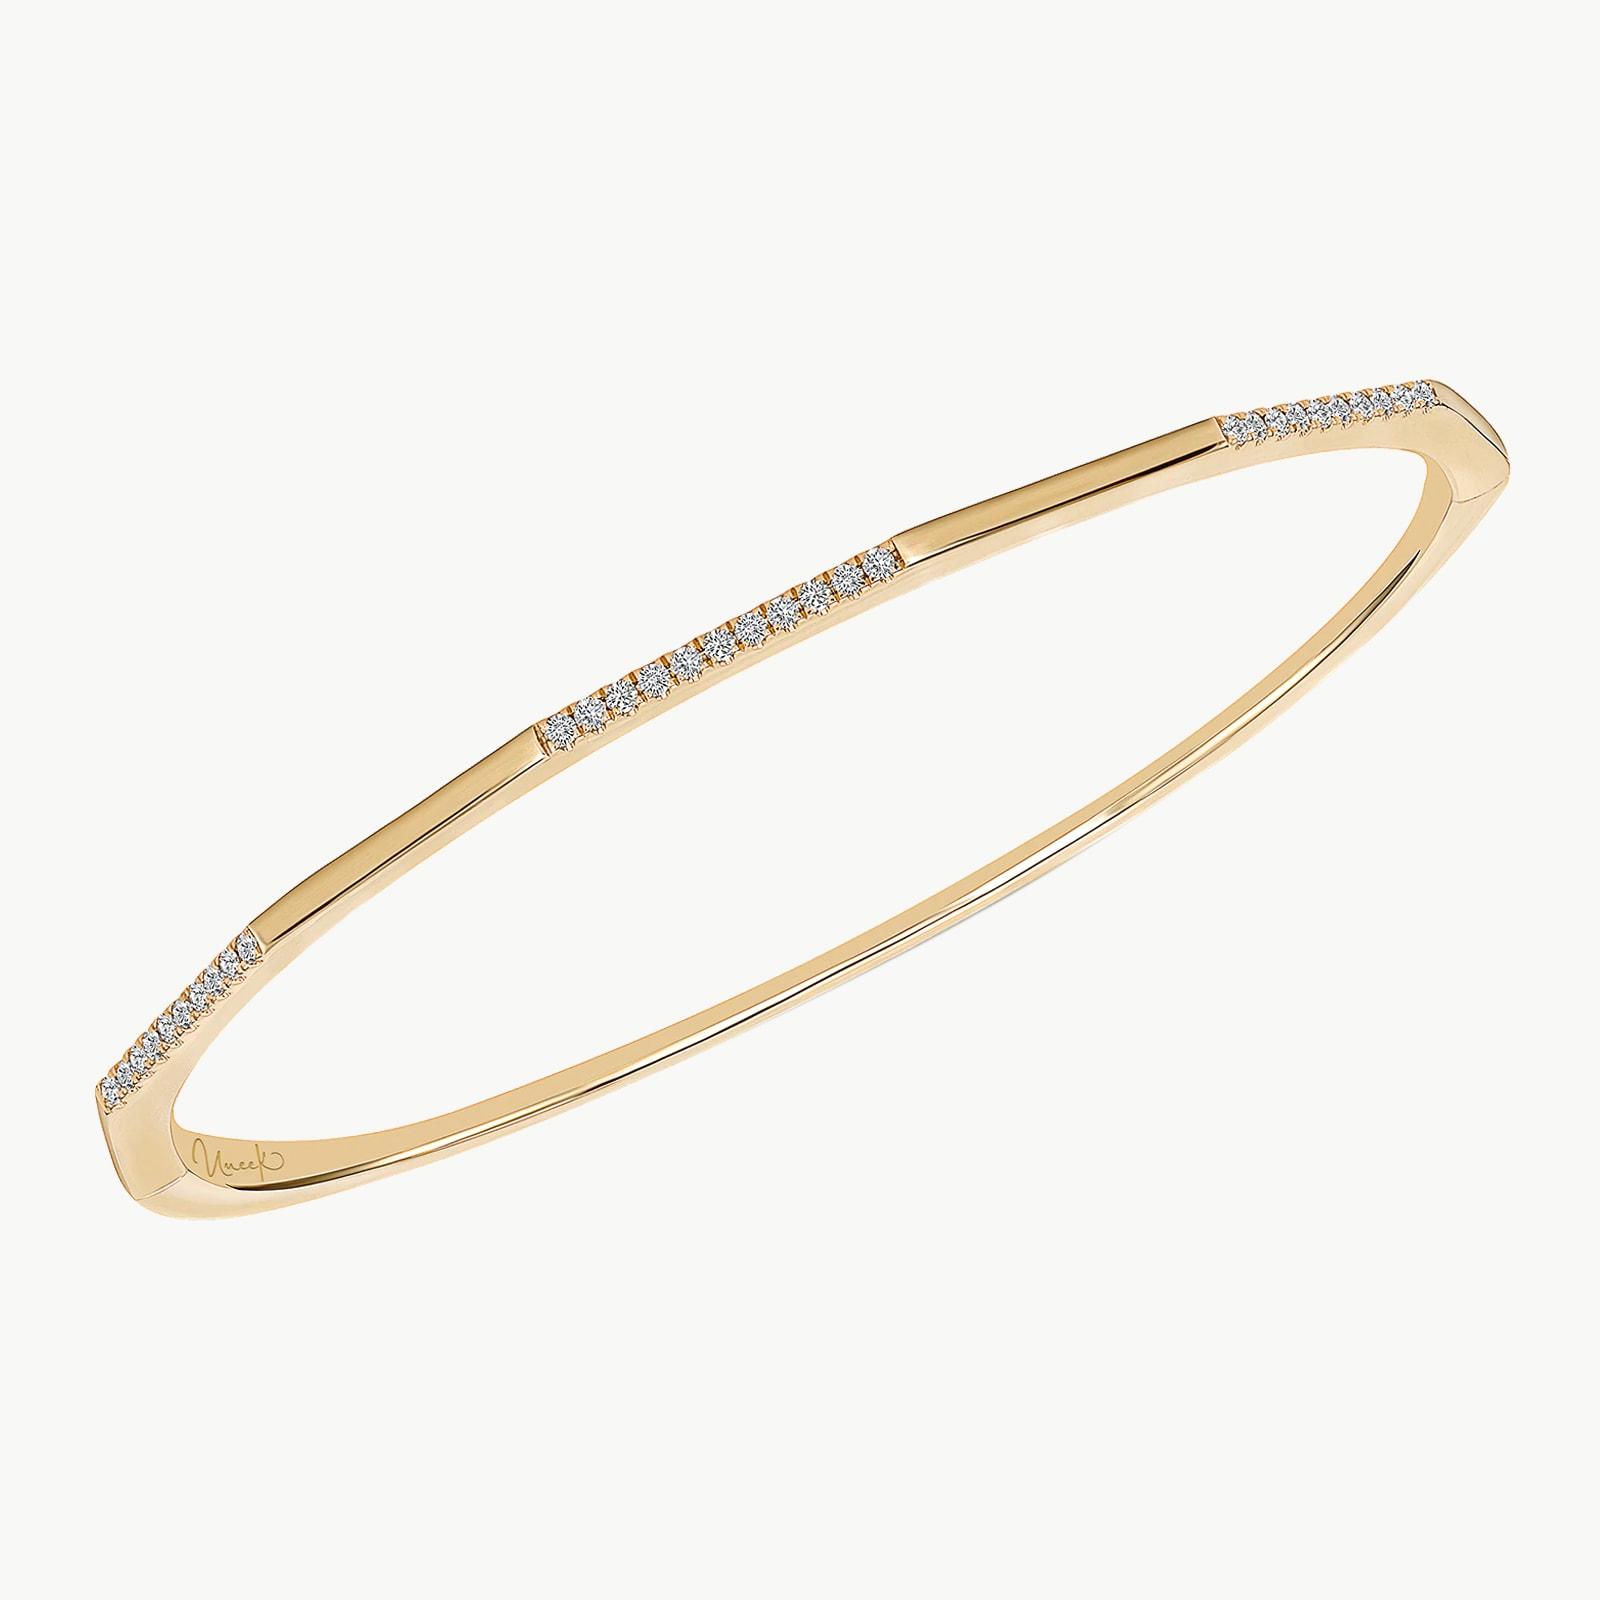 14k Yellow Gold 0.23cttw Diamond Stackable Bangle